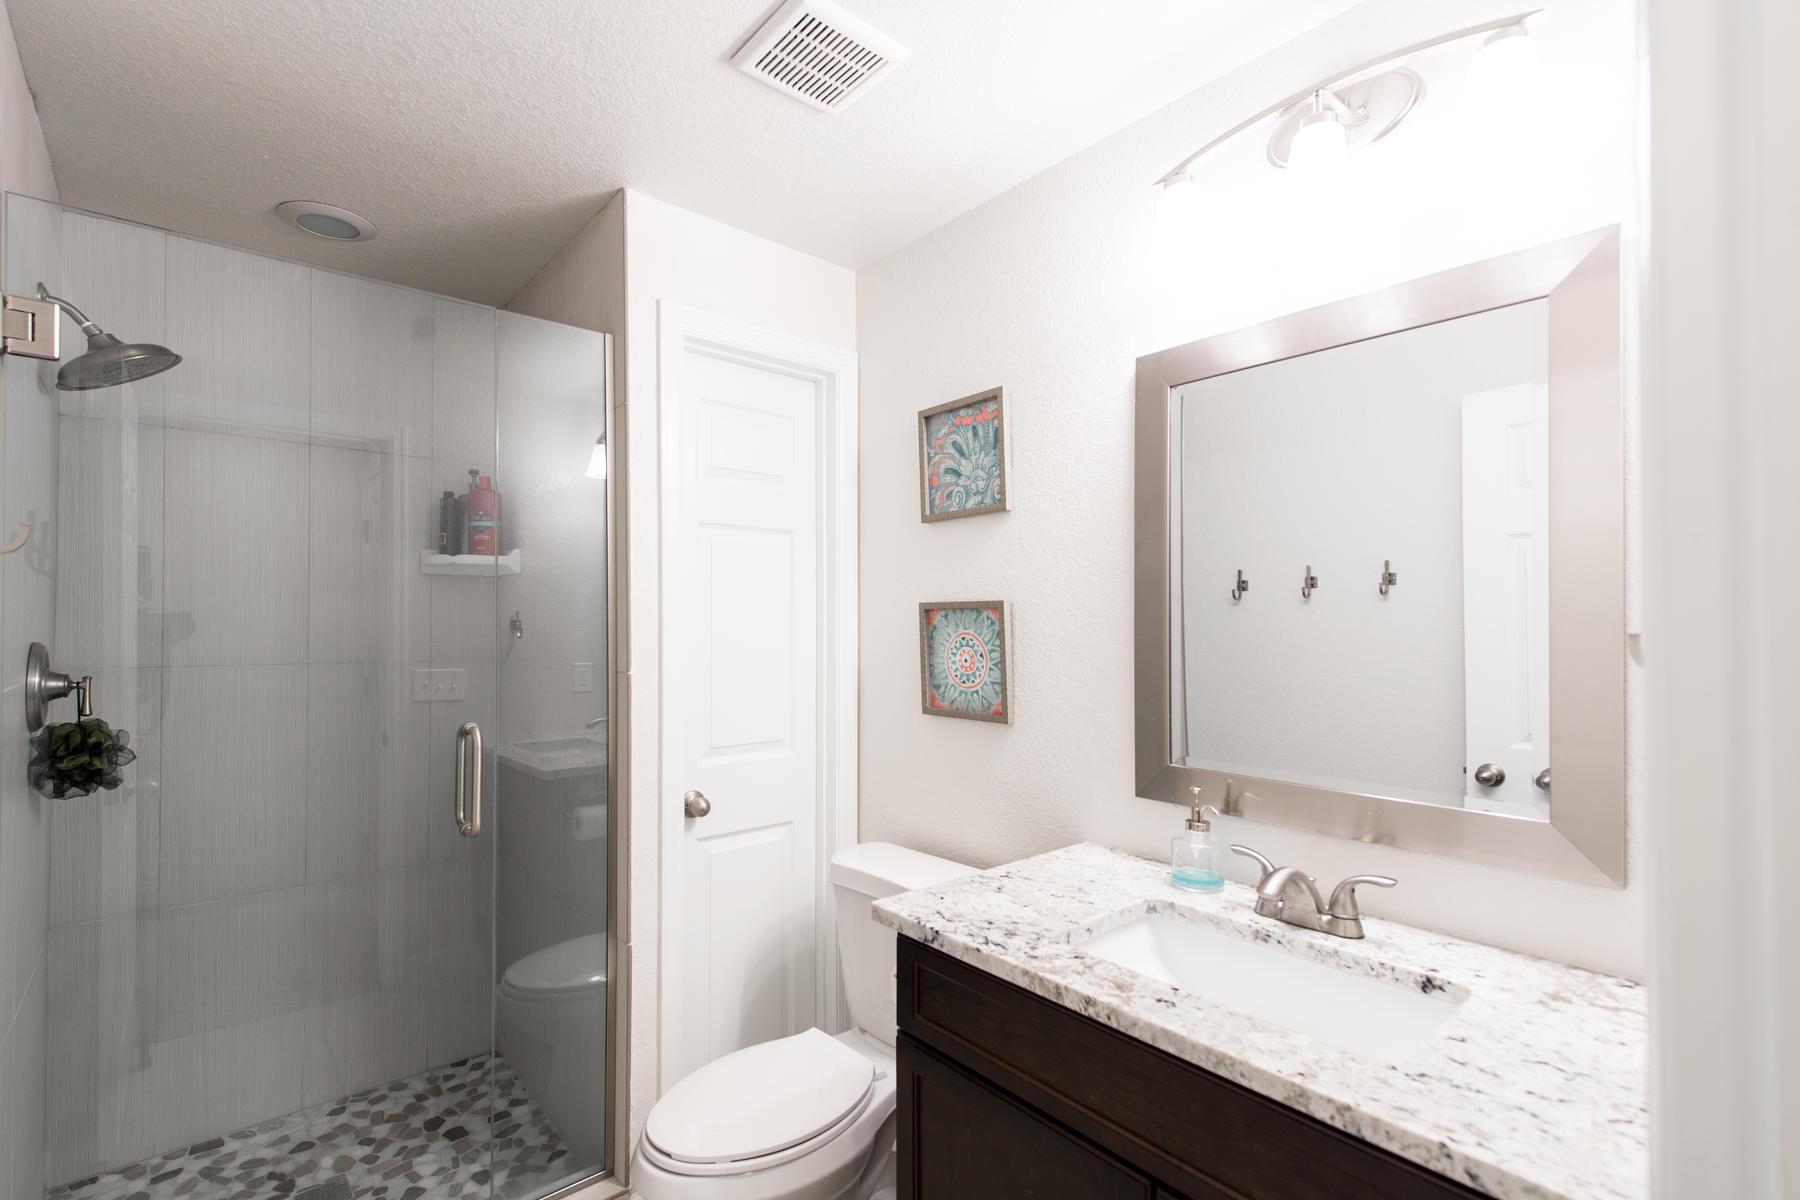 Additional photo for property listing at 6193 S Jackson Gap Ct 6193 S Jackson Gap Ct Aurora, Colorado 80016 United States